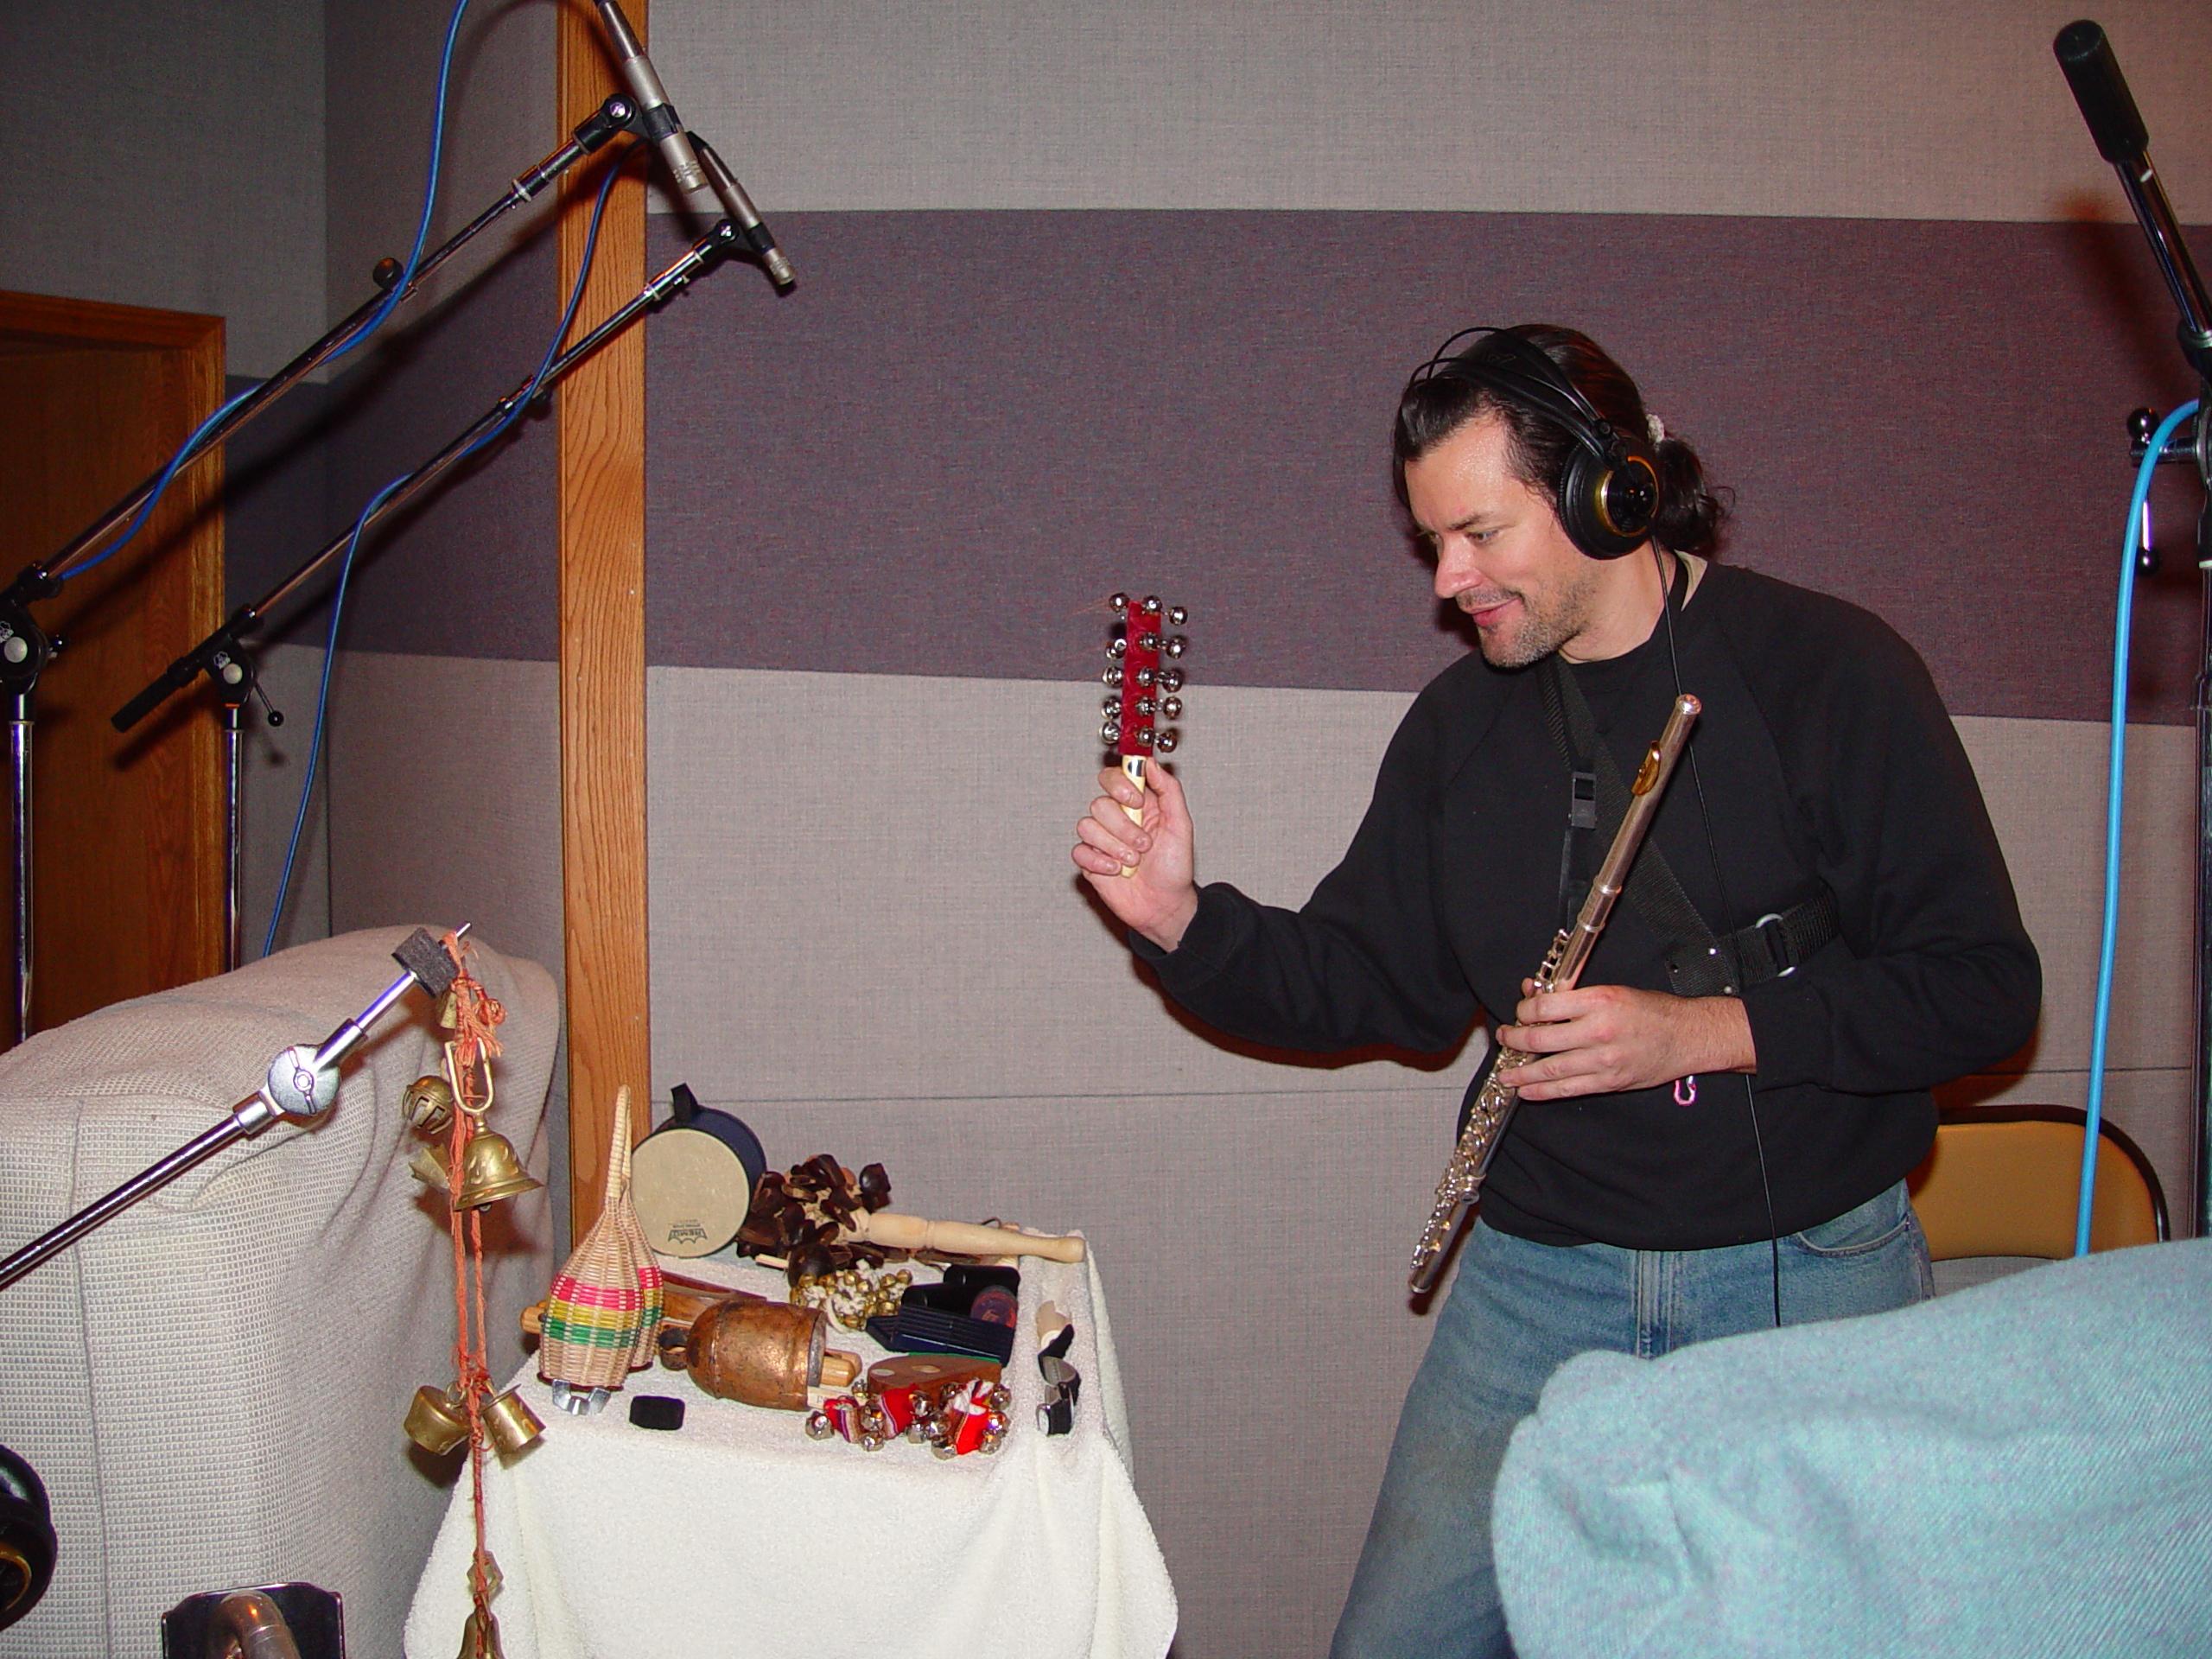 James plays everything!